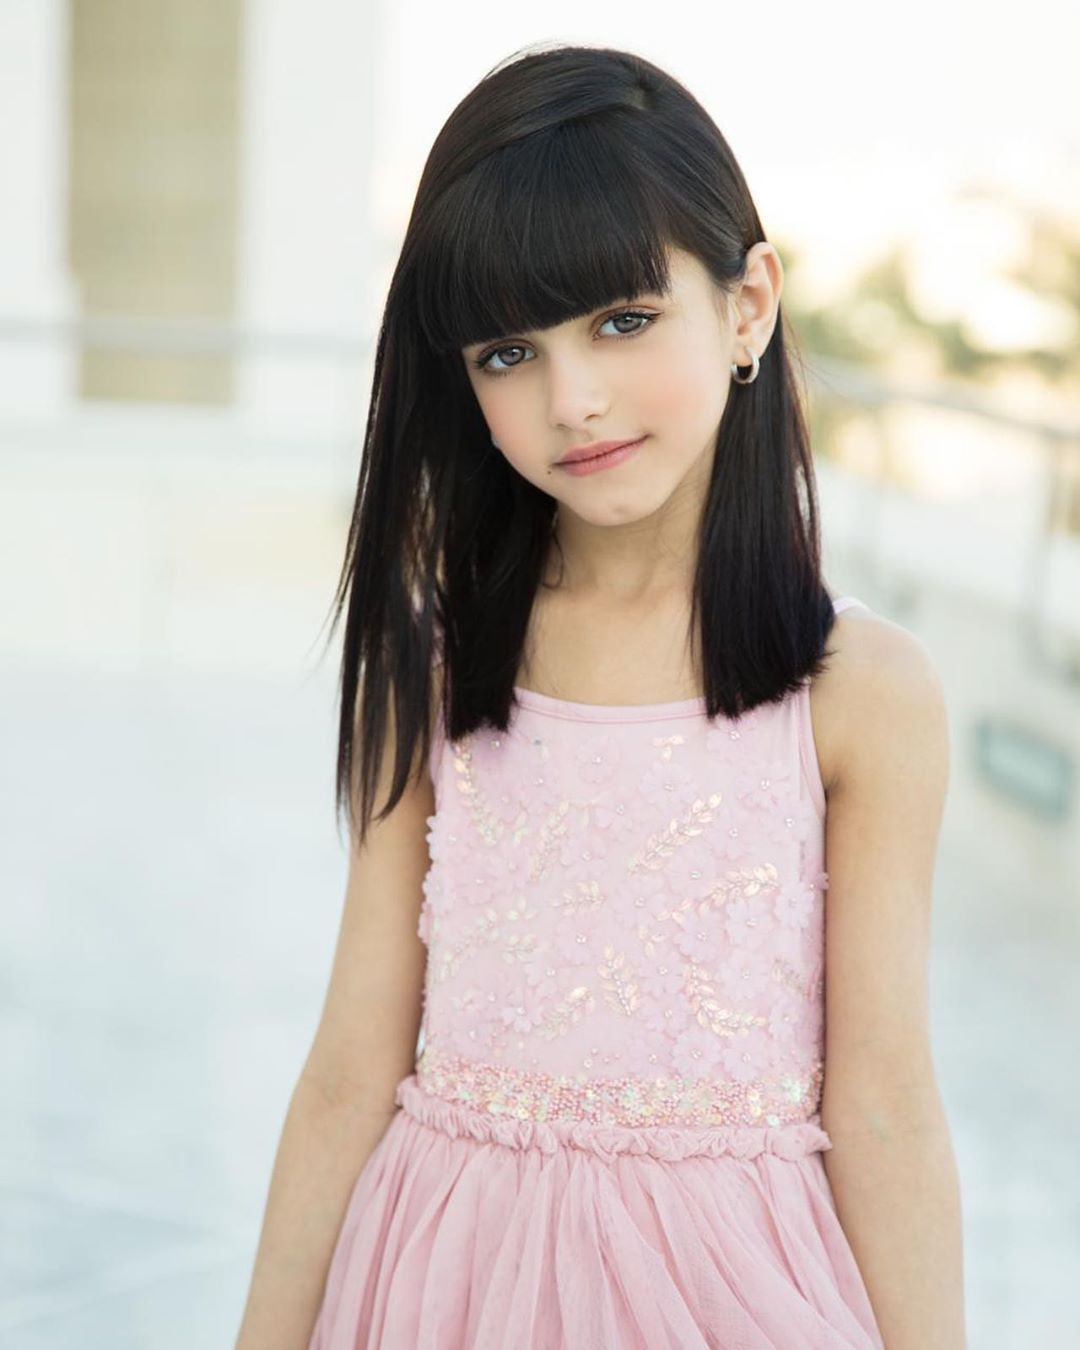 نورة دانة الدوسري On Instagram ㅤㅤㅤㅤㅤ ㅤ ㅤㅤㅤㅤㅤㅤㅤ ㅤ ㅤㅤㅤㅤㅤ ㅤㅤㅤㅤㅤㅤ ㅤ ㅤ ㅤㅤㅤㅤㅤ Cute Little Baby Girl Mommy Daughter Photos Hair Videos